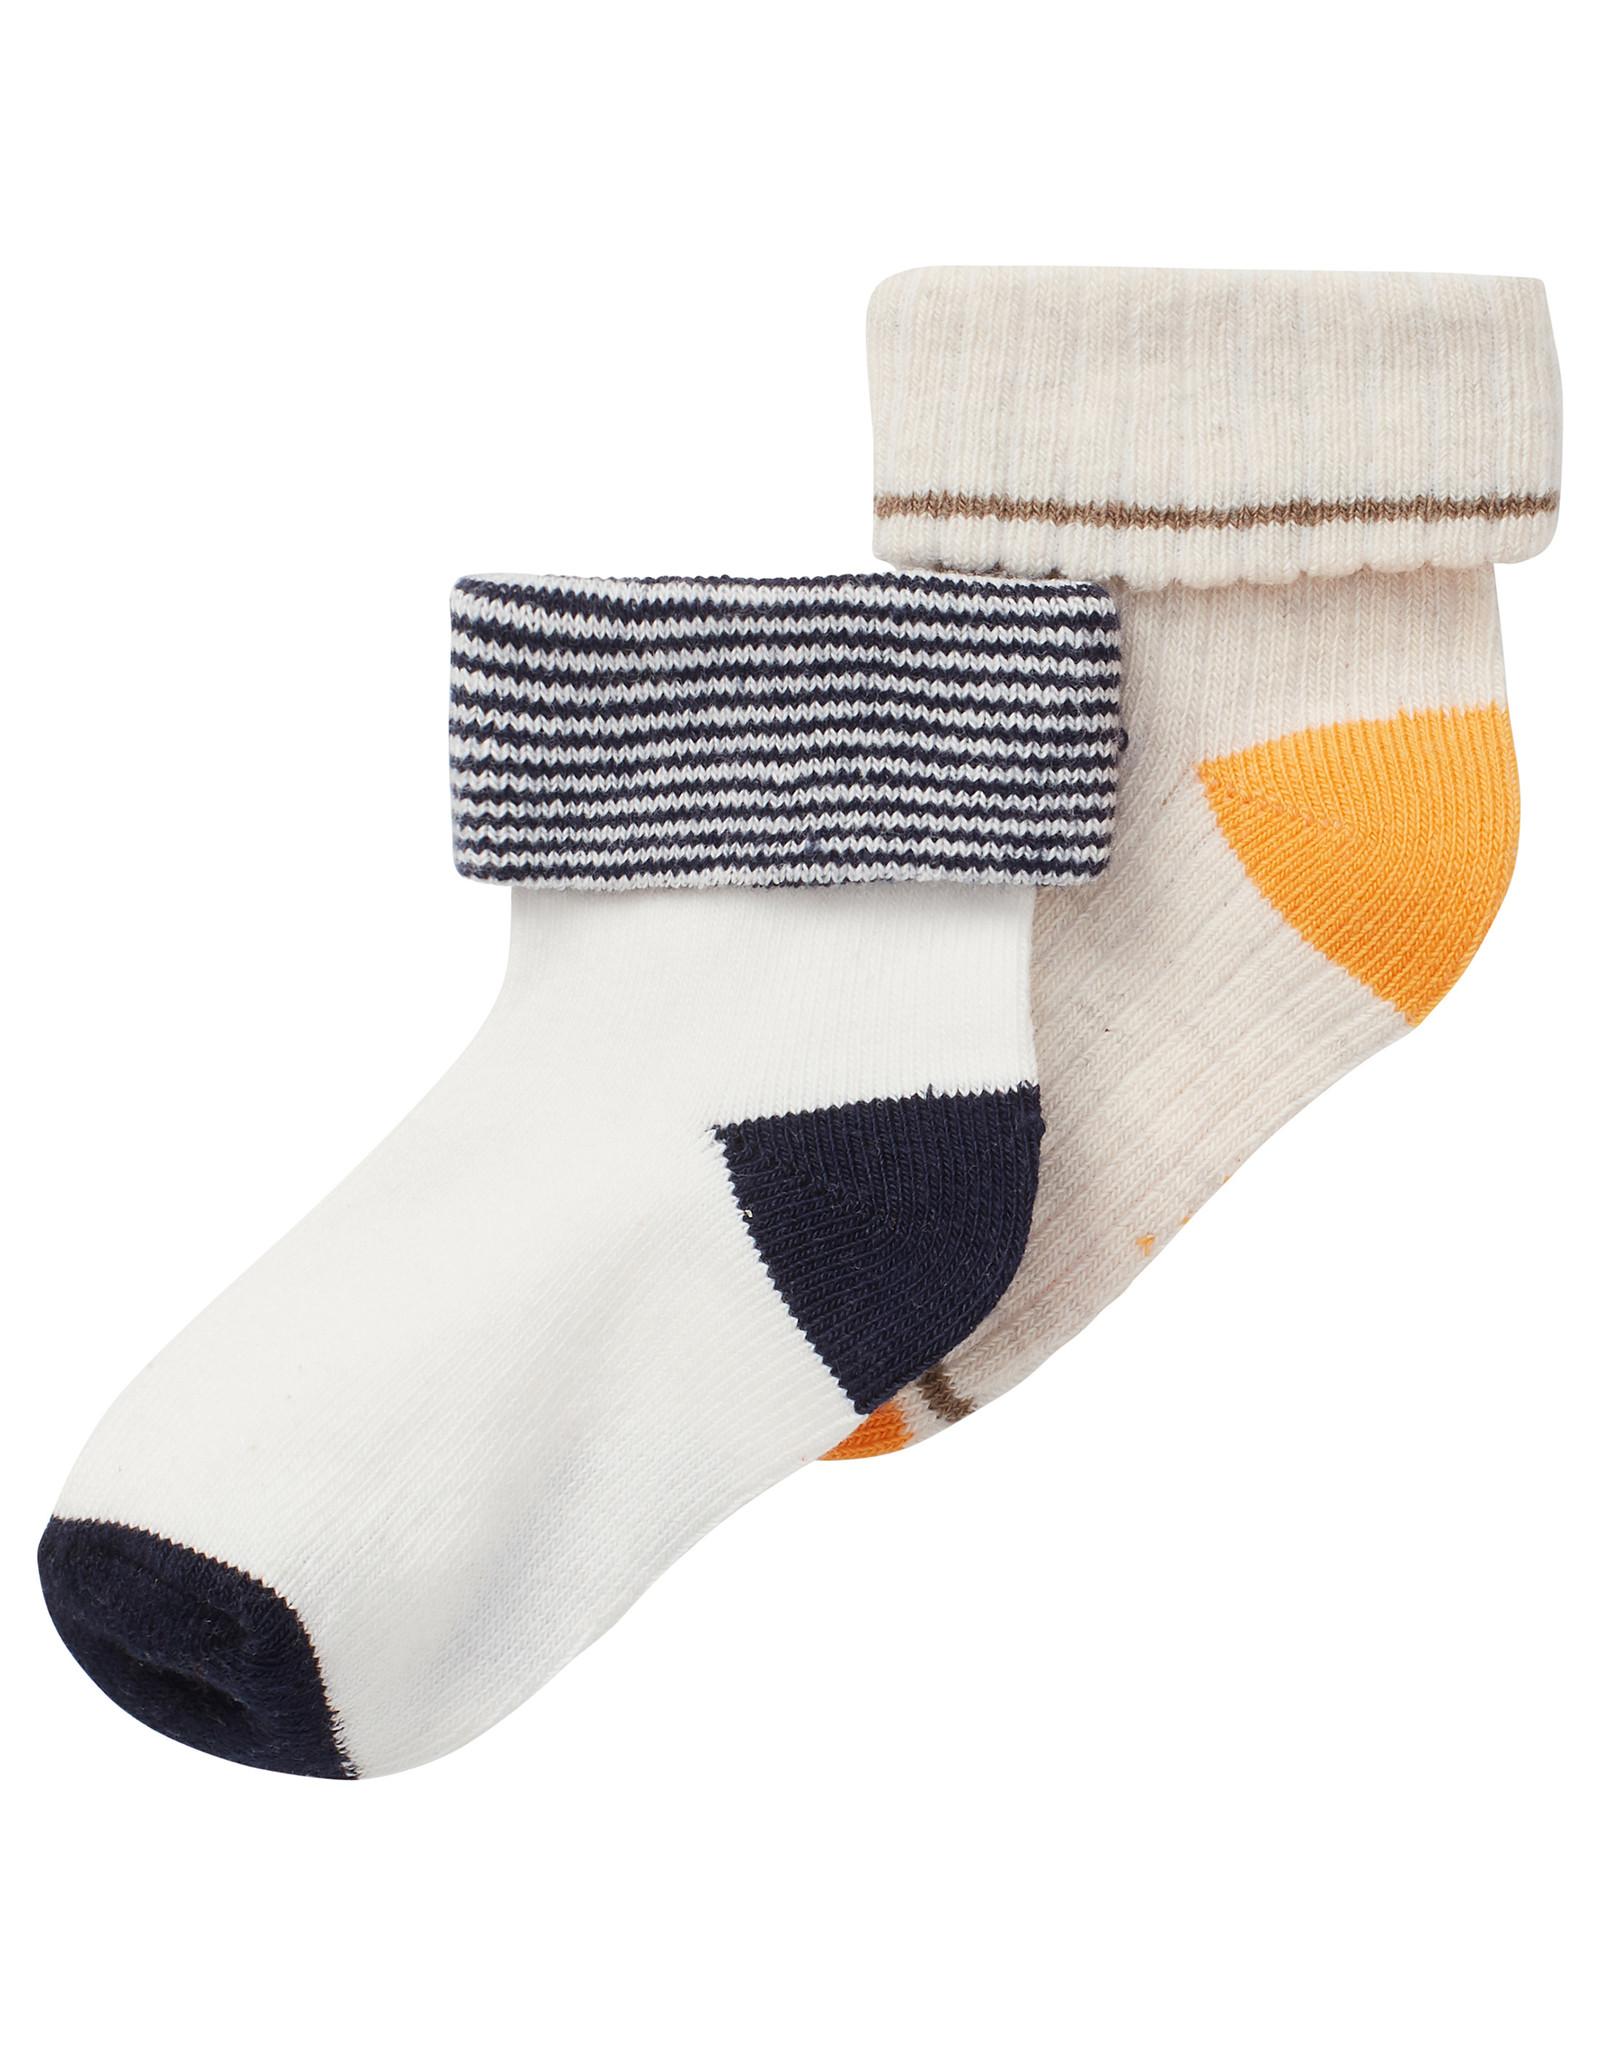 Noppies B Socks 2PCK Treviso